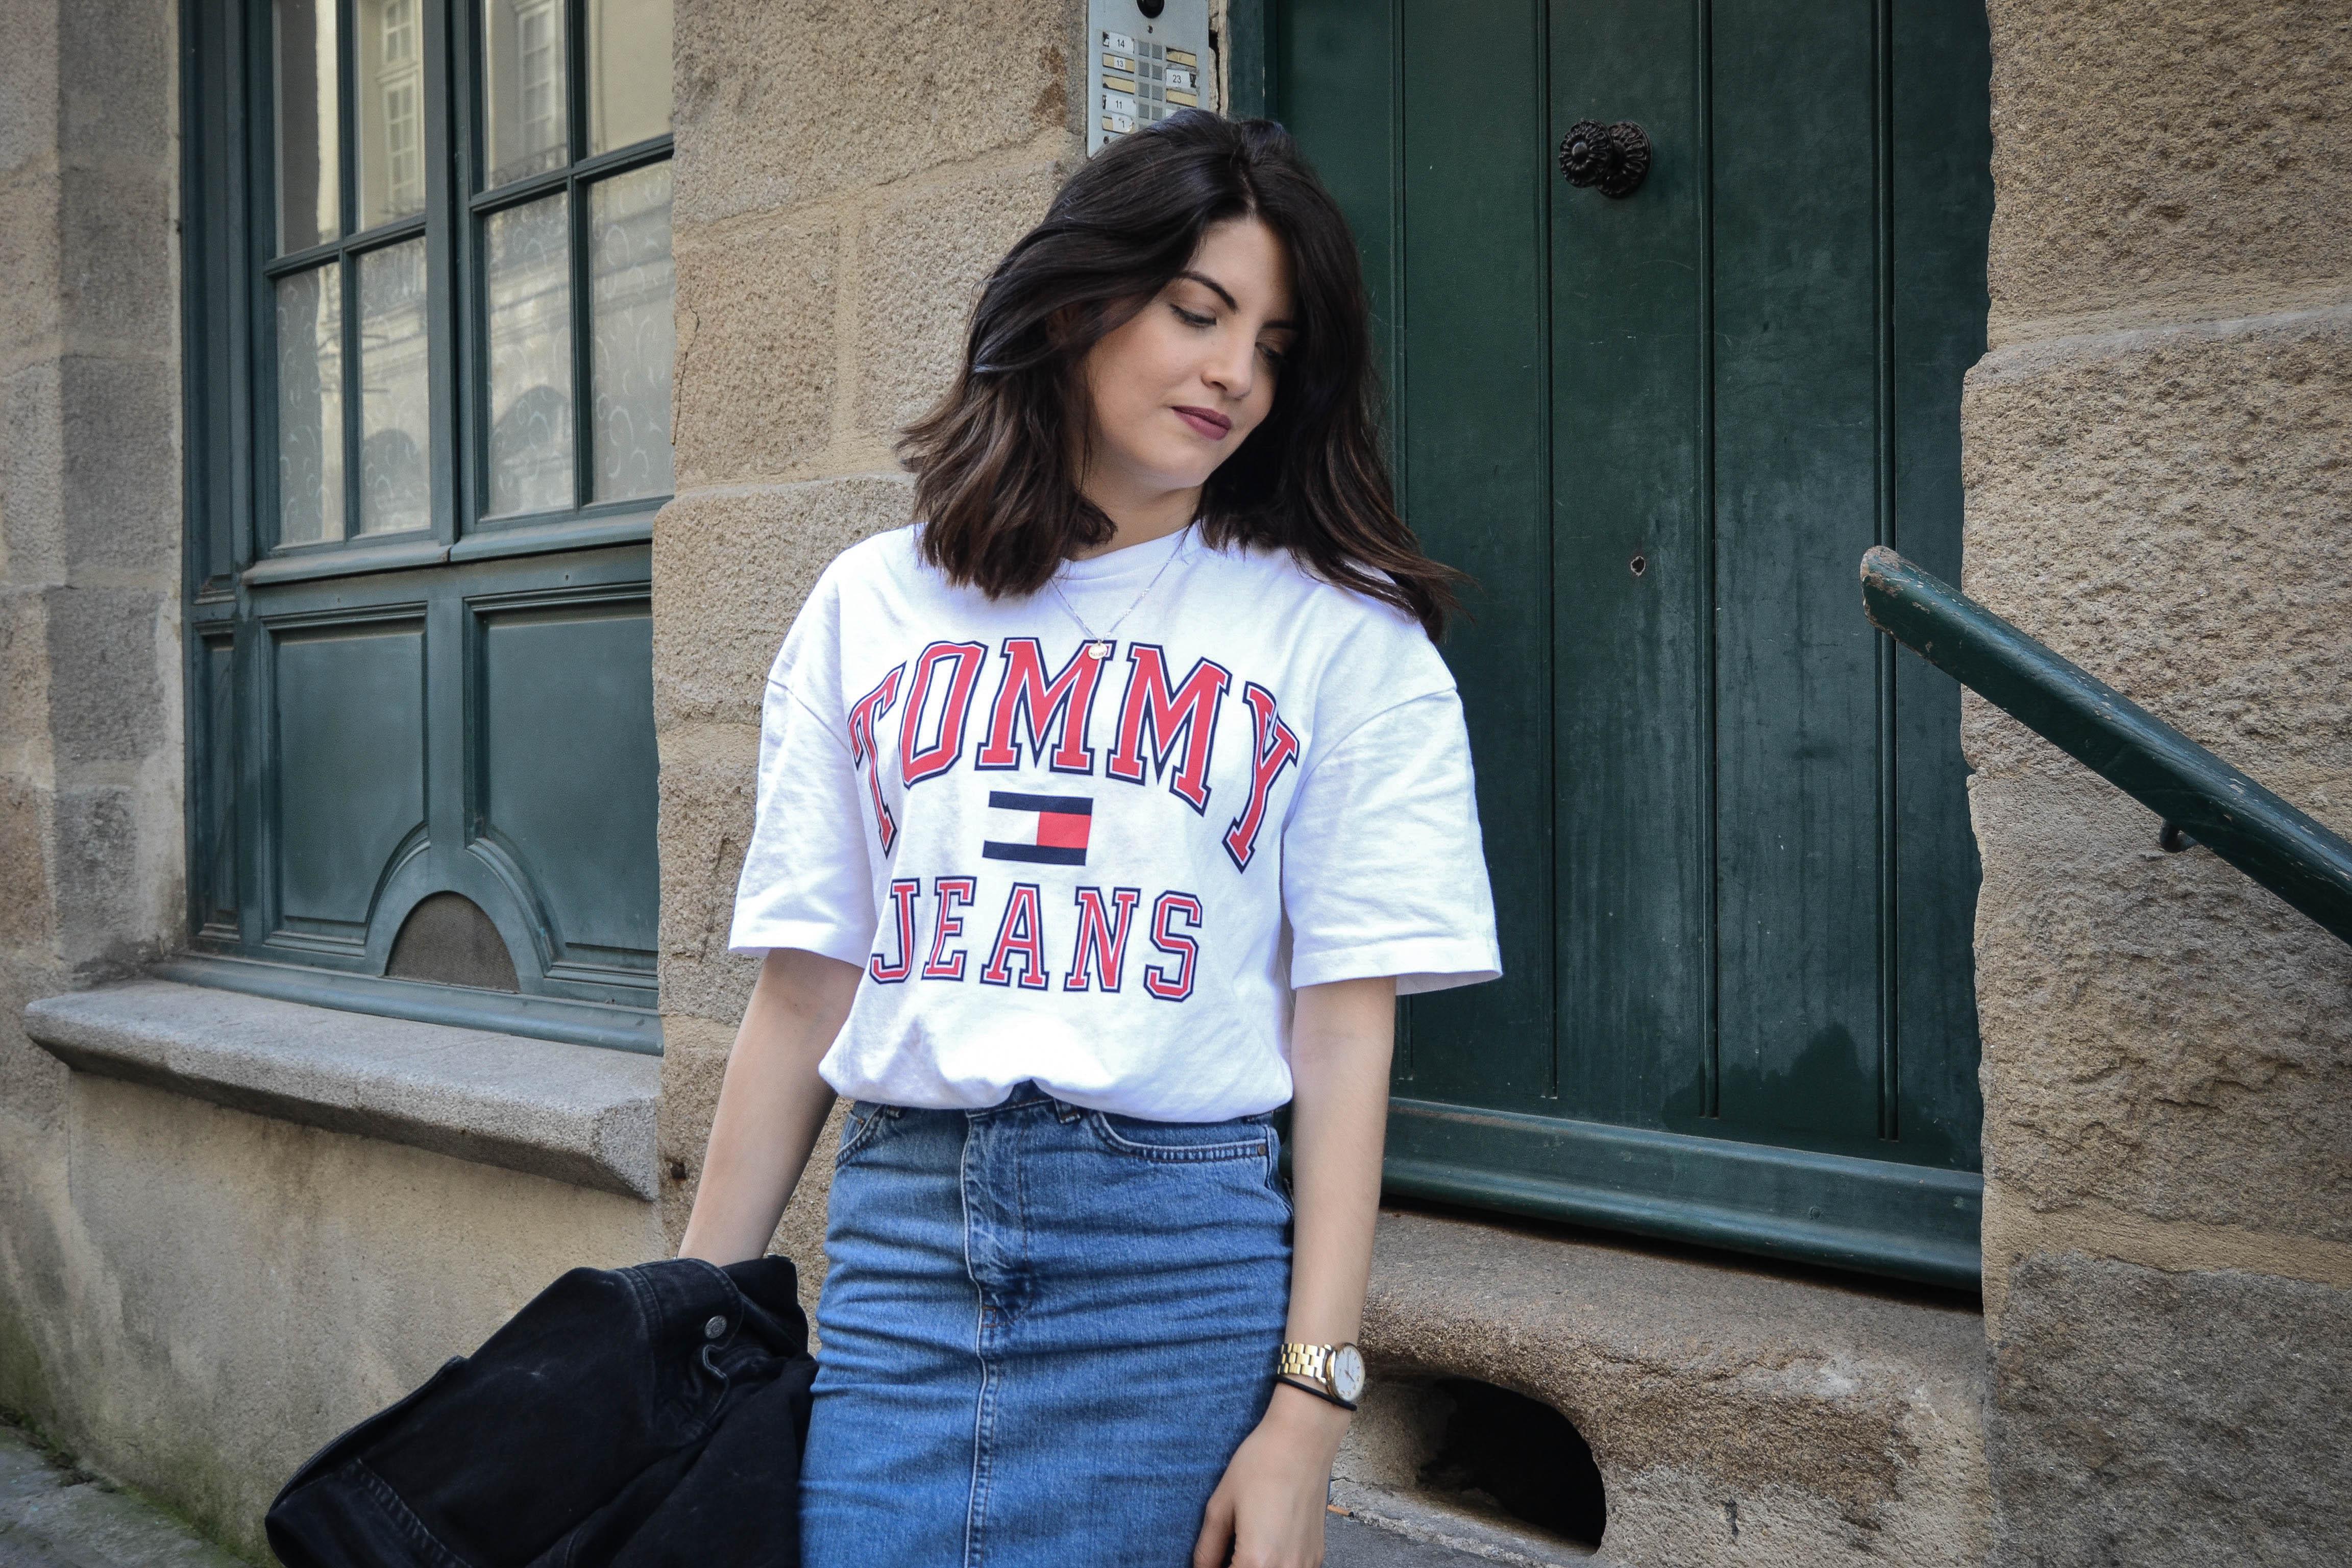 jupe en jean tommy tenue du jour image